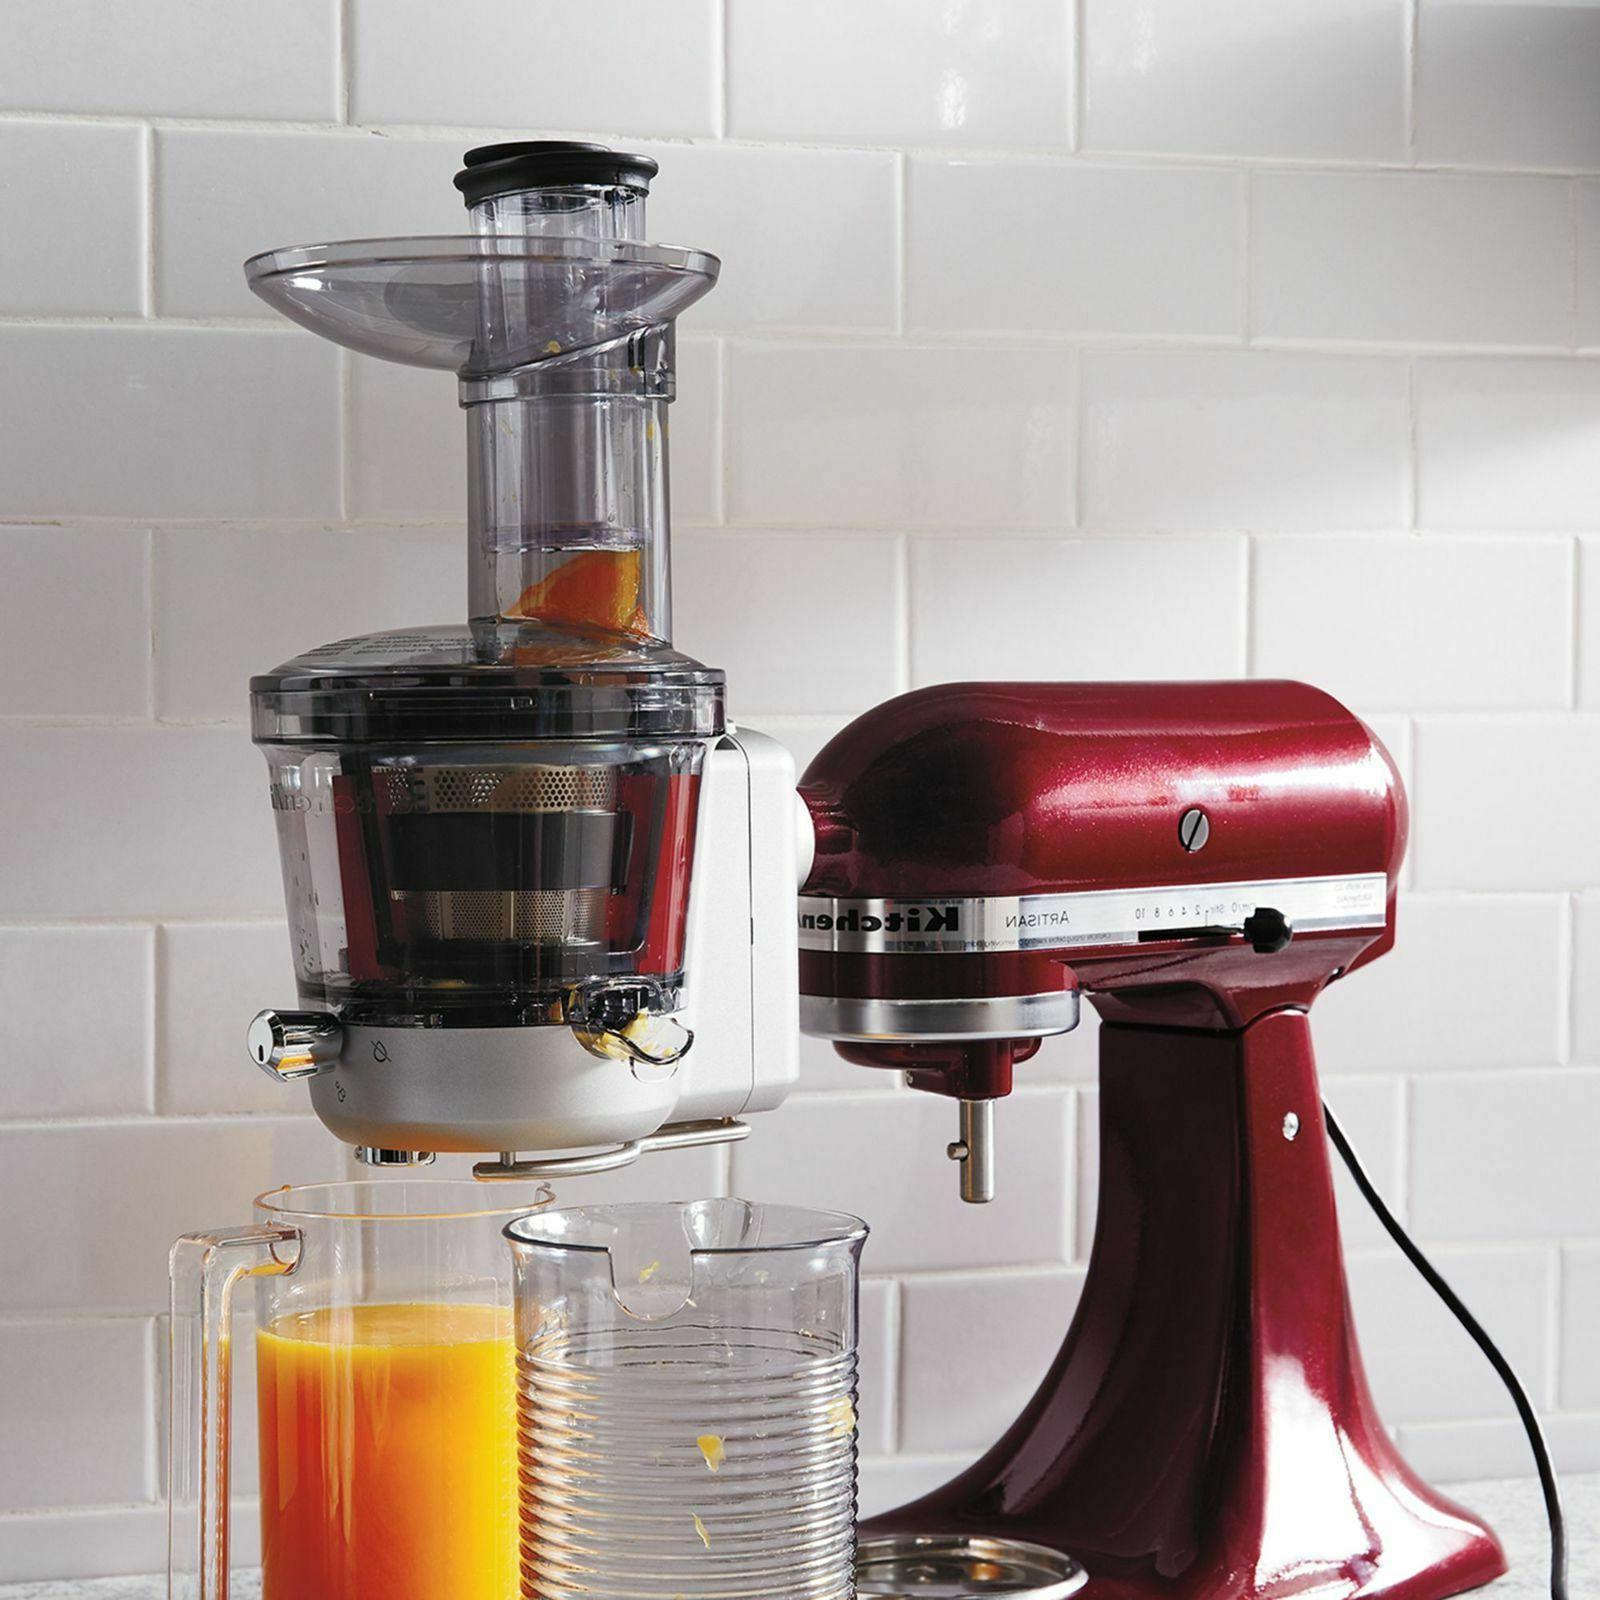 KitchenAid and Sauce Compact Wide